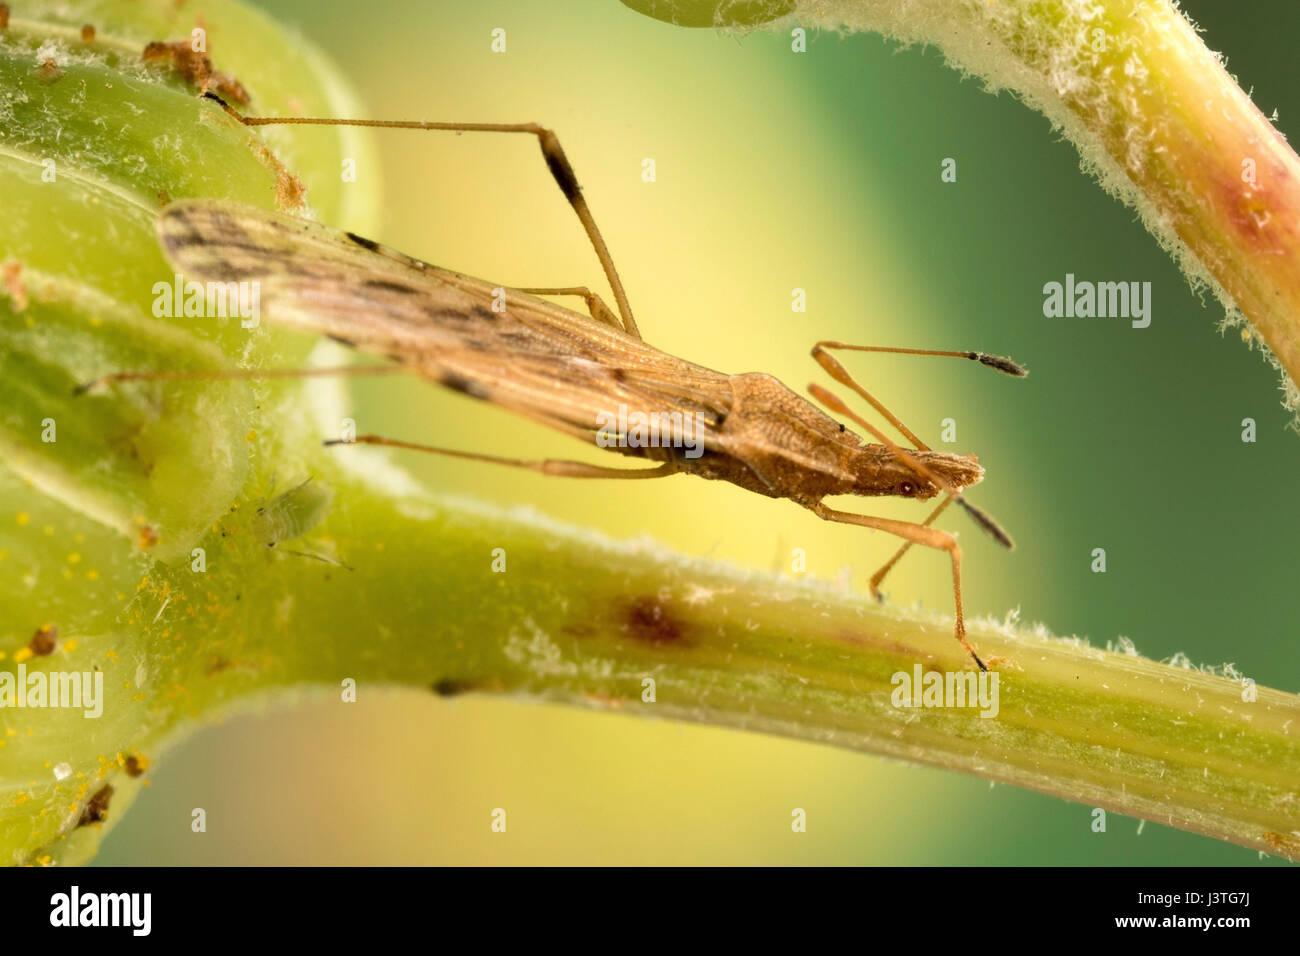 Tiny elongated bodied beetle - Stock Image